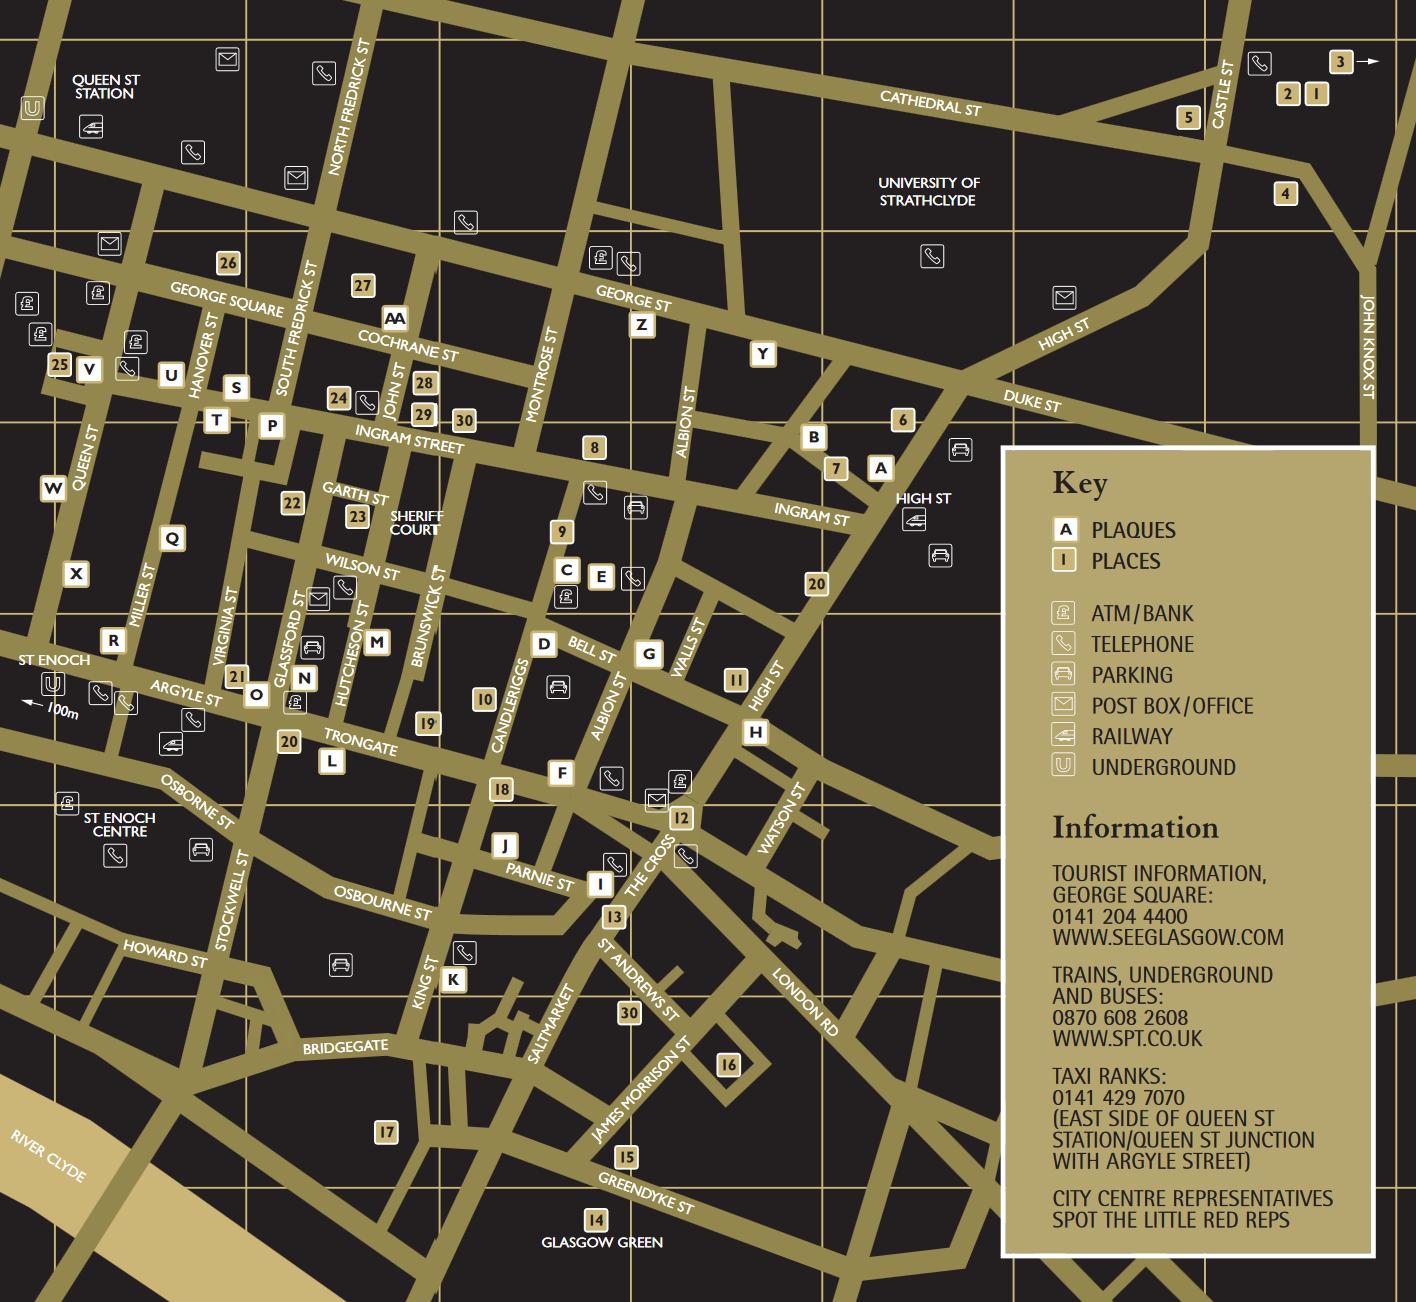 Screenshot_2019-06-29 OBSCURE 4515c NOV08 OBSCURE 250805 - merchant-city-obscure-history pdf